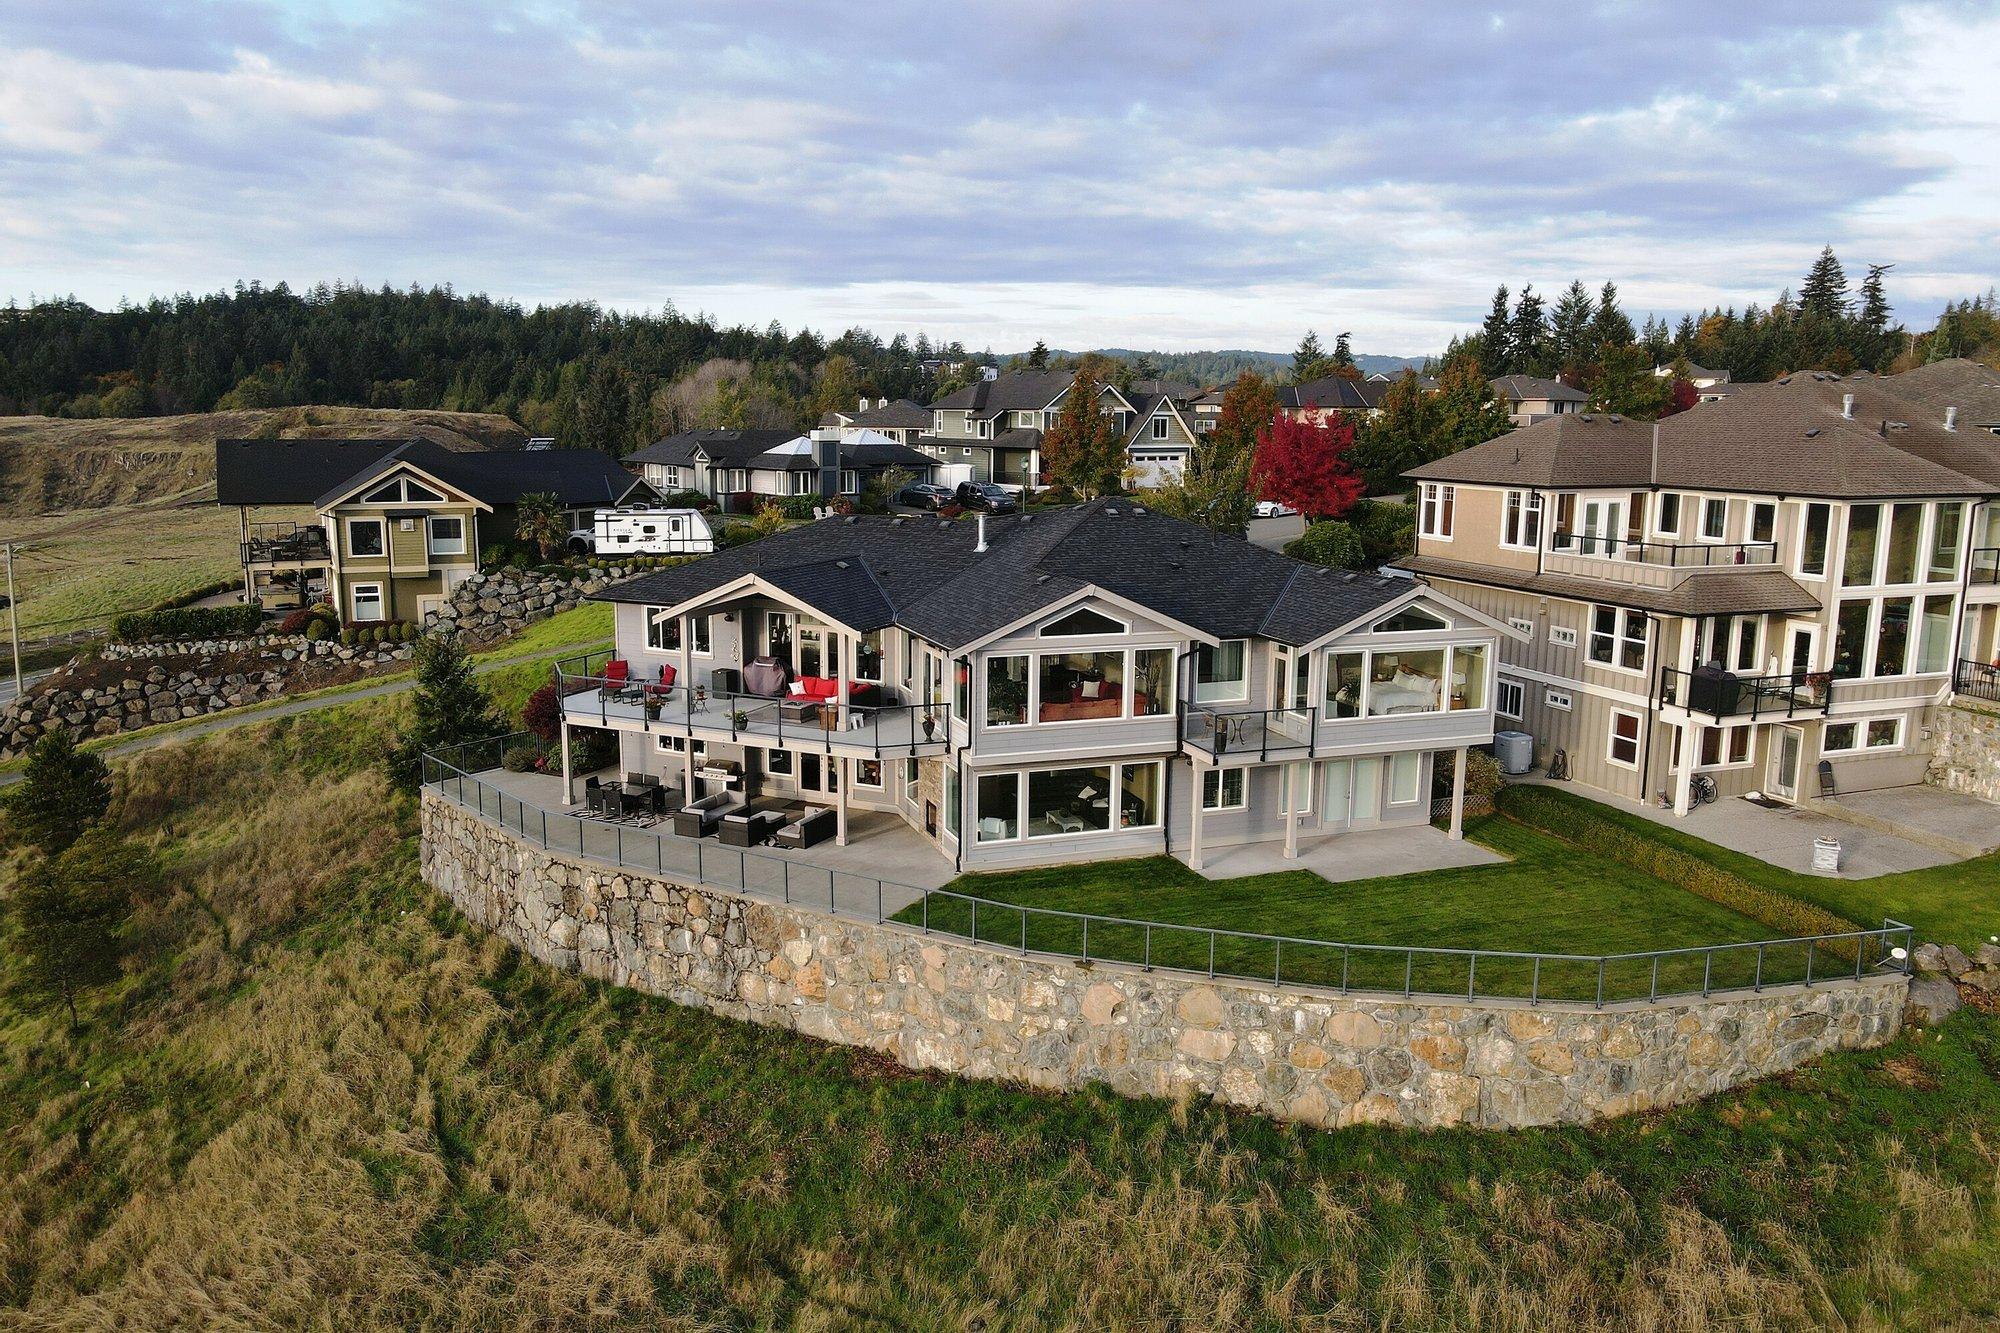 House in Victoria, British Columbia, Canada 1